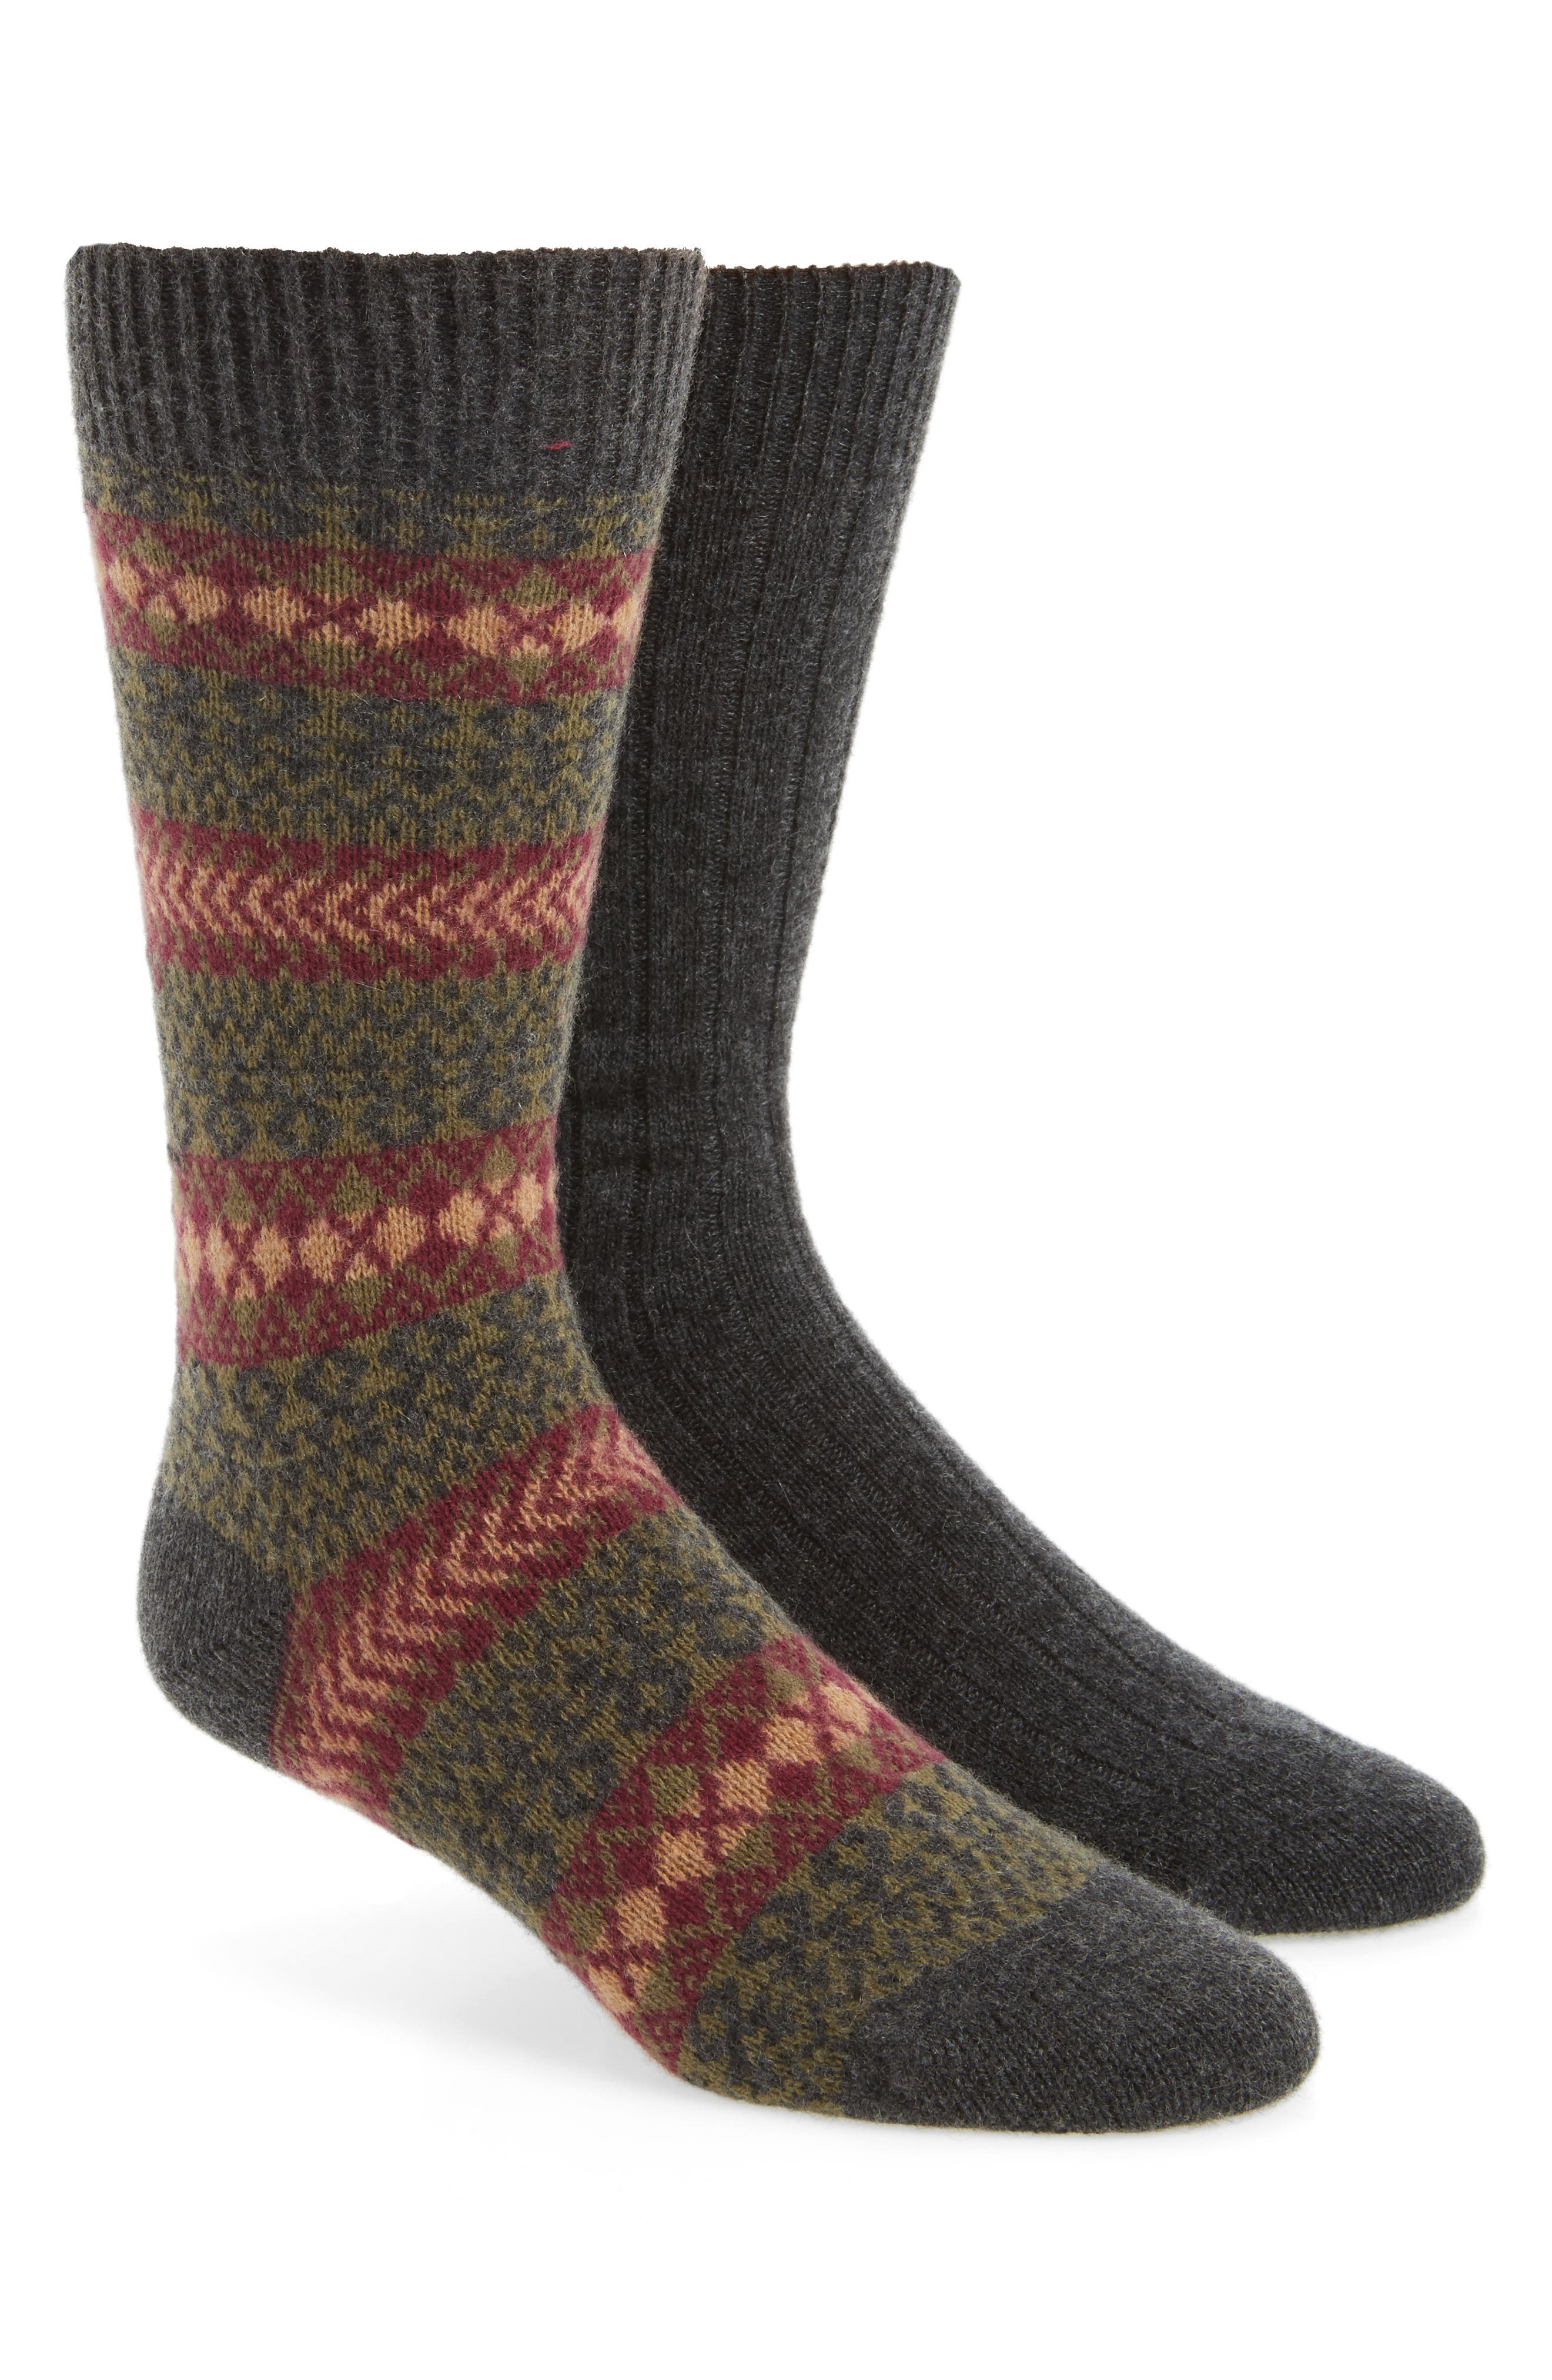 2-Pack Cashmere Blend Socks,                             Main thumbnail 1, color,